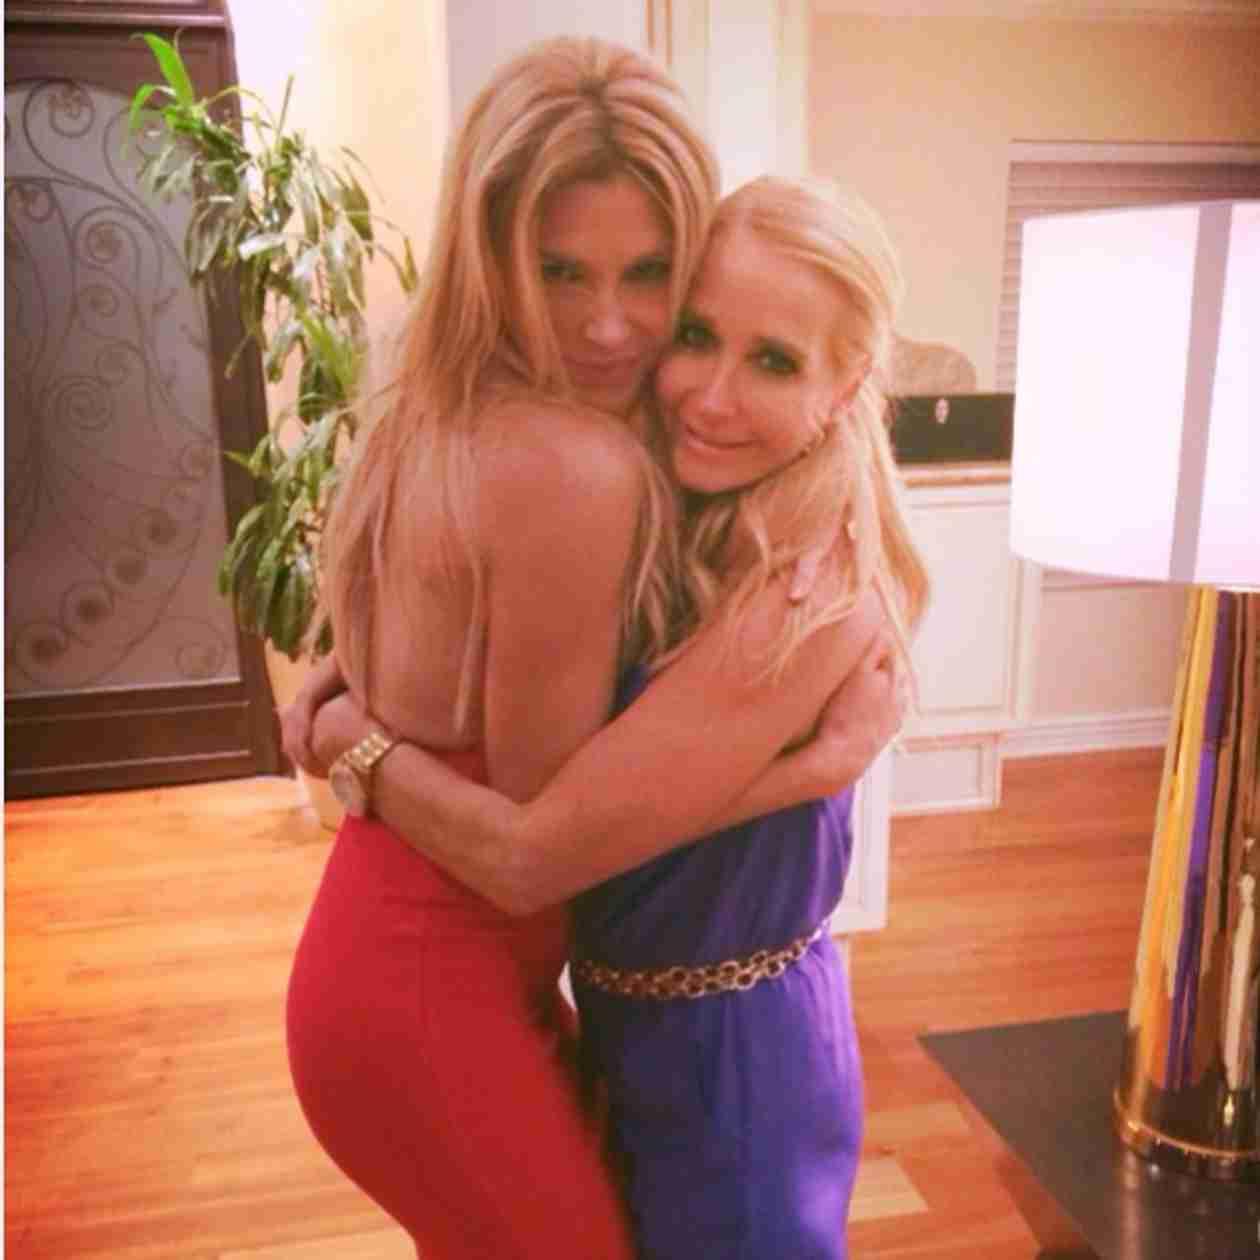 Kim Richards Looks Healthy After Hospital Stay, Bonds With Brandi Glanville